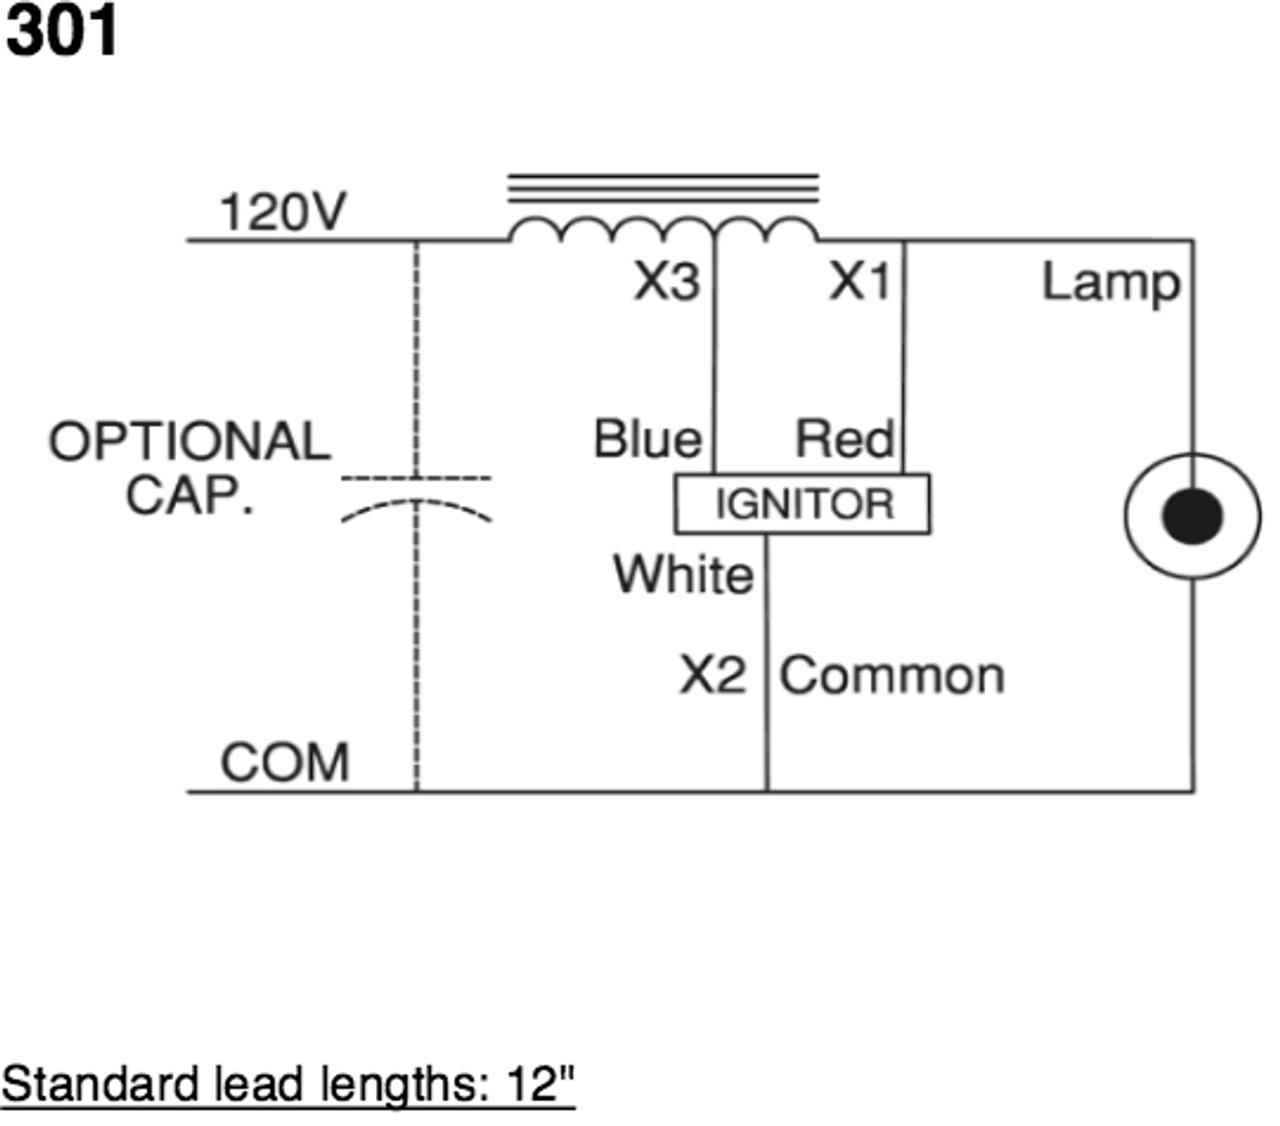 small resolution of blu0050a04900 ballast blu0050a04900 kit blu0050a04900 wire diagram blu0050a04900 dimensions